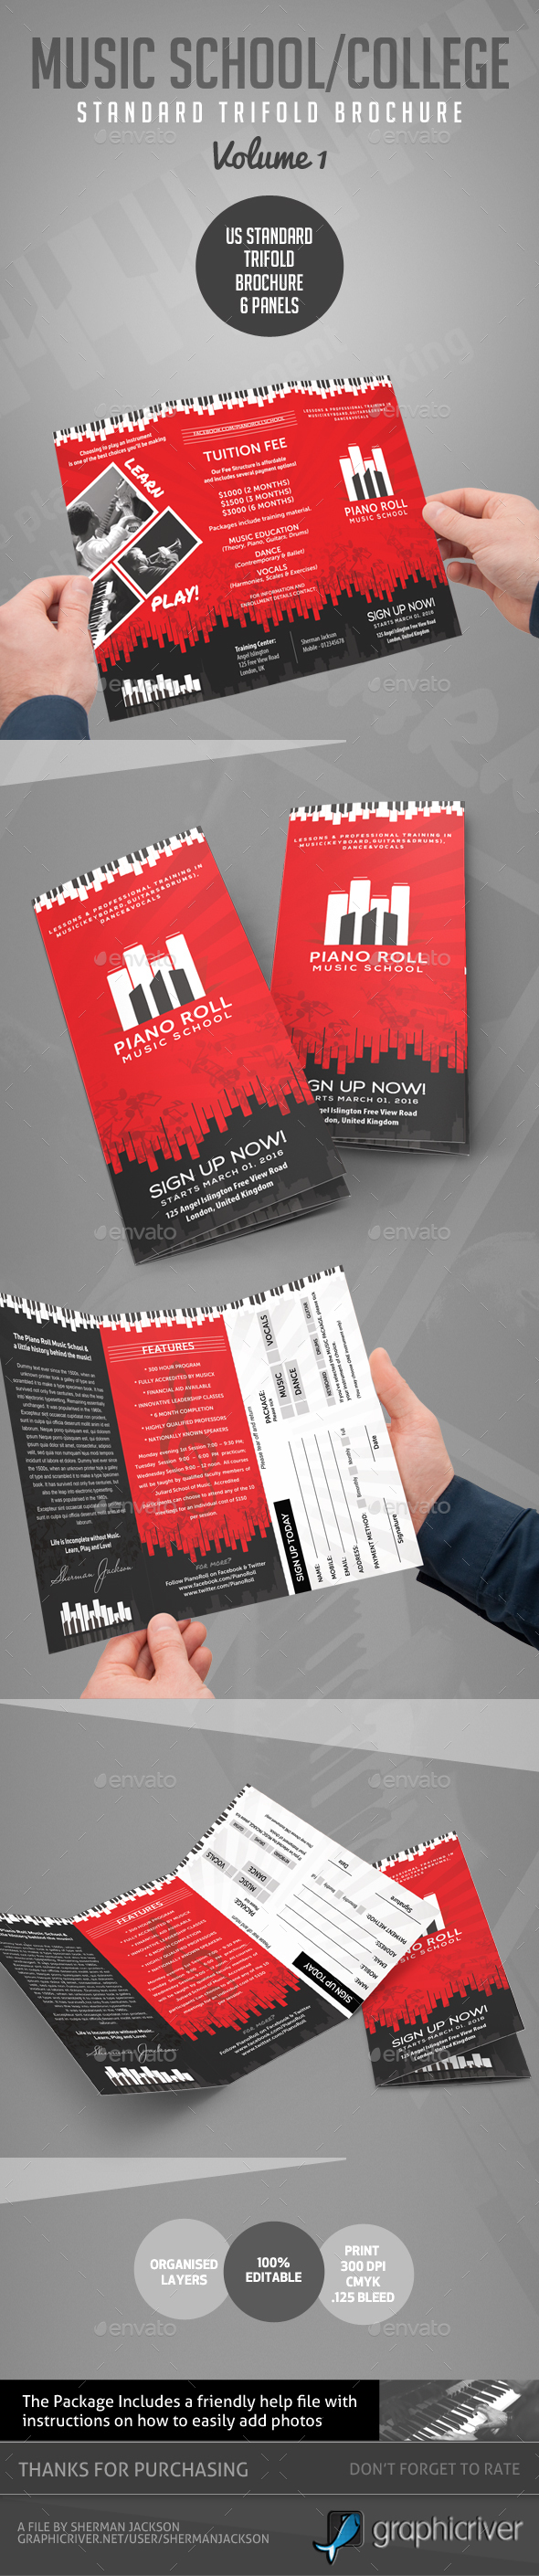 Music College & School Creative Art Brochure - Brochures Print Templates